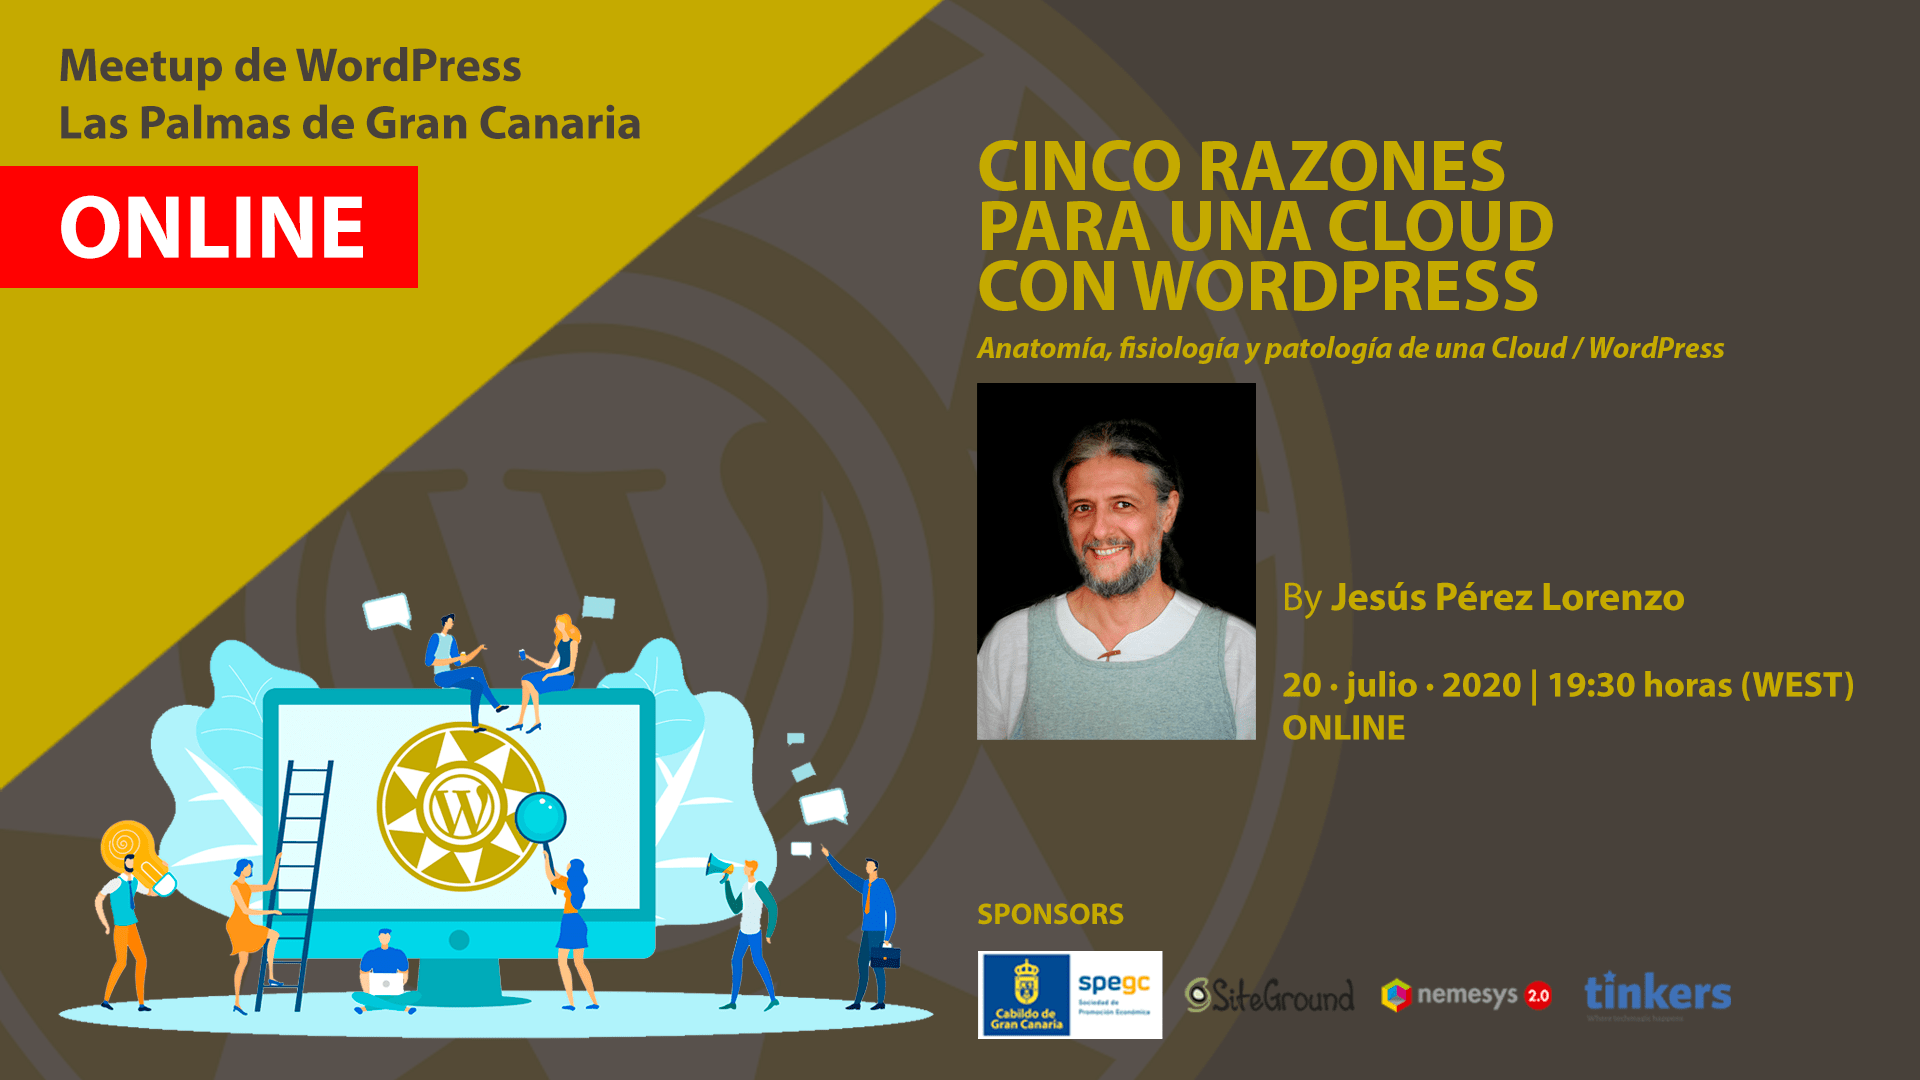 Cartela Meetup Jesús Pérez Lorenzo sobre cloud con WordPress